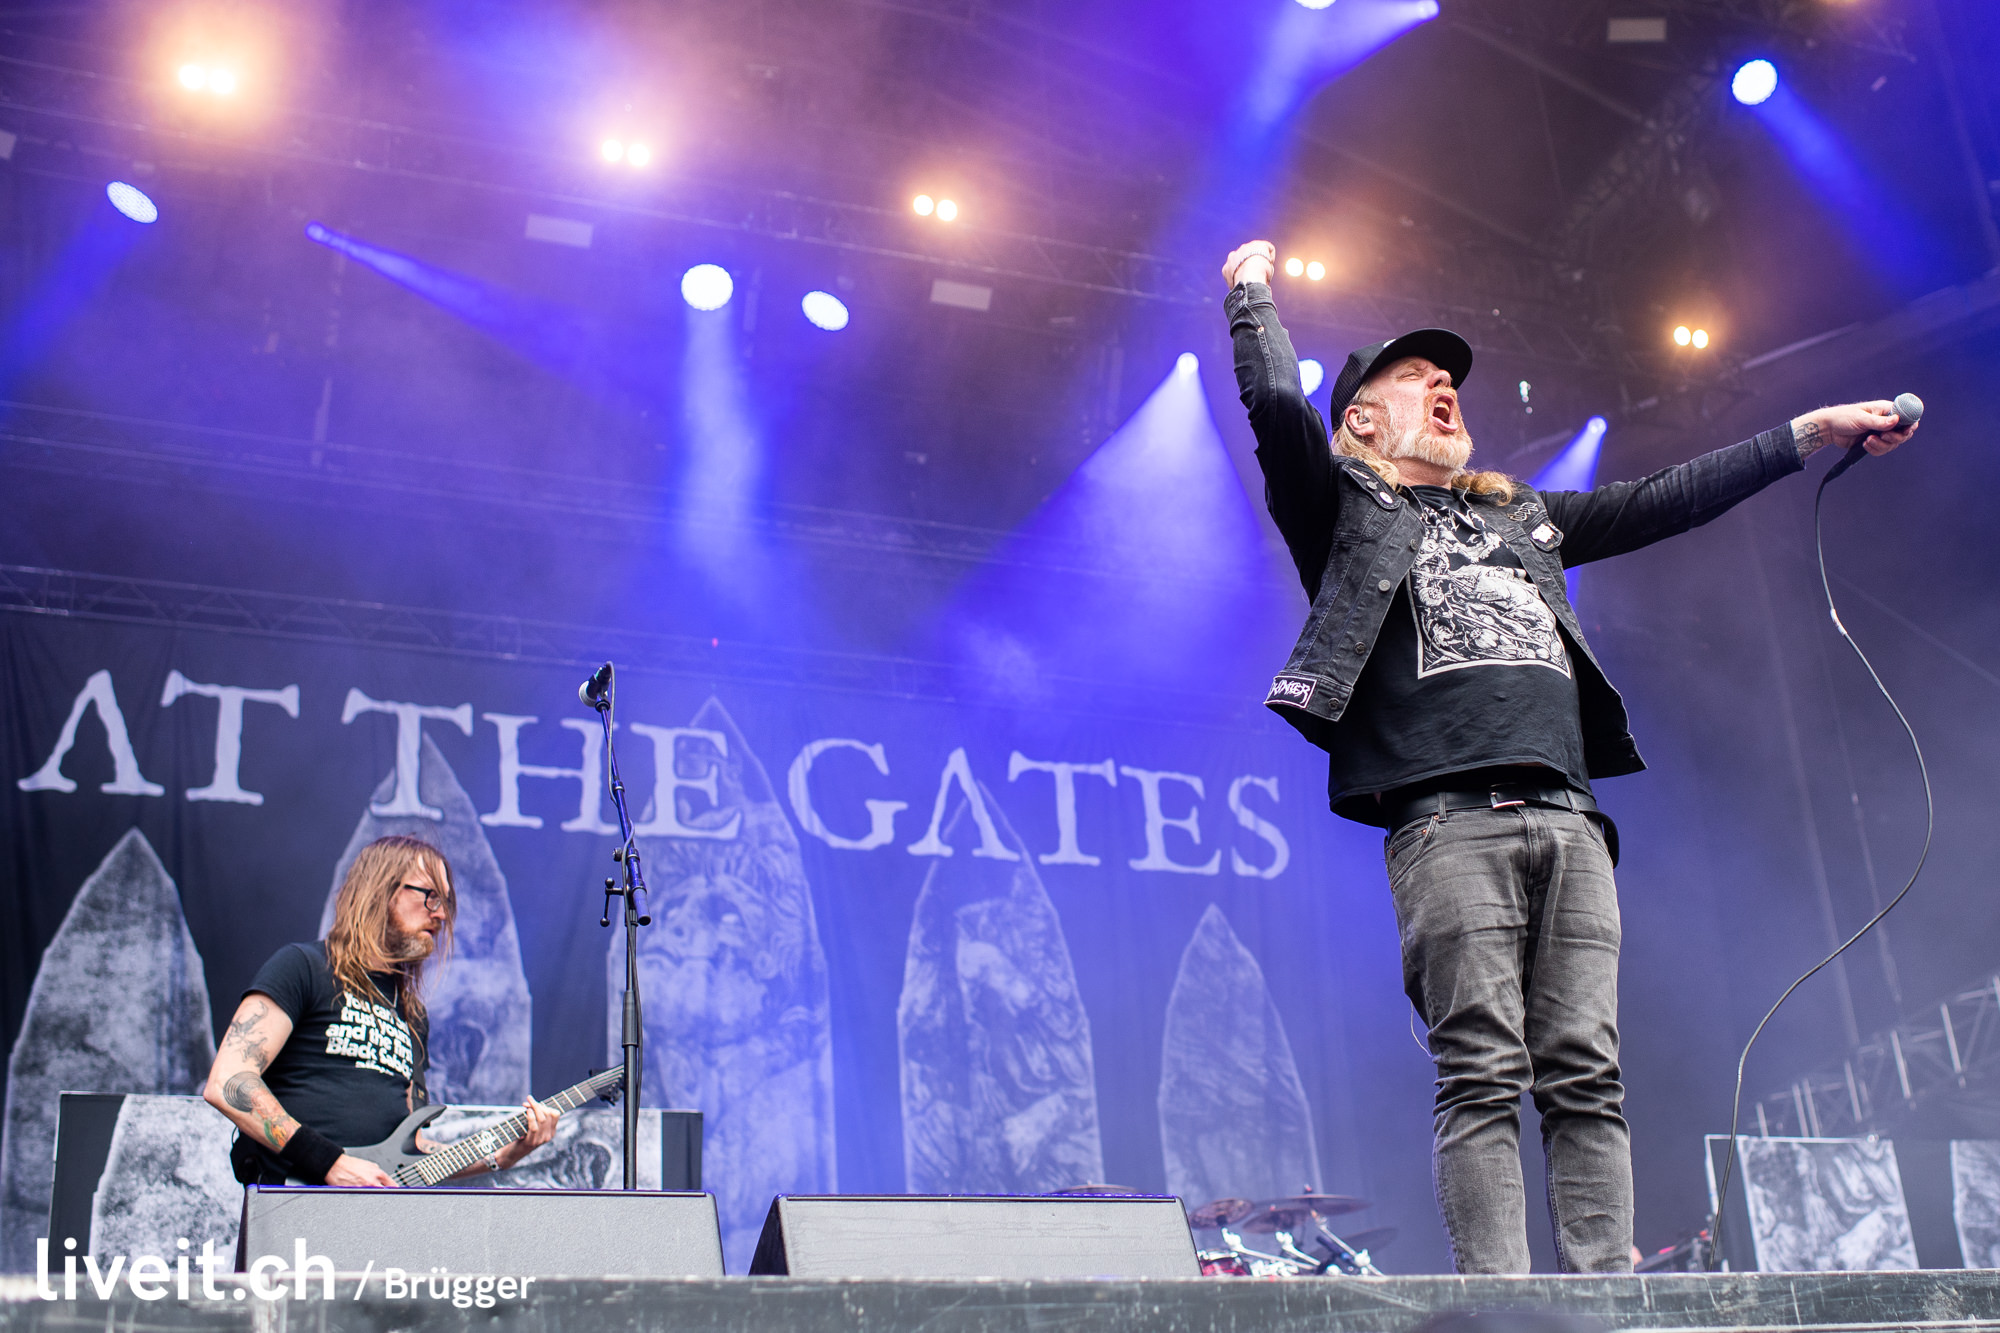 SCHWEIZ GREENFIELD FESTIVAL 2019 At The Gates